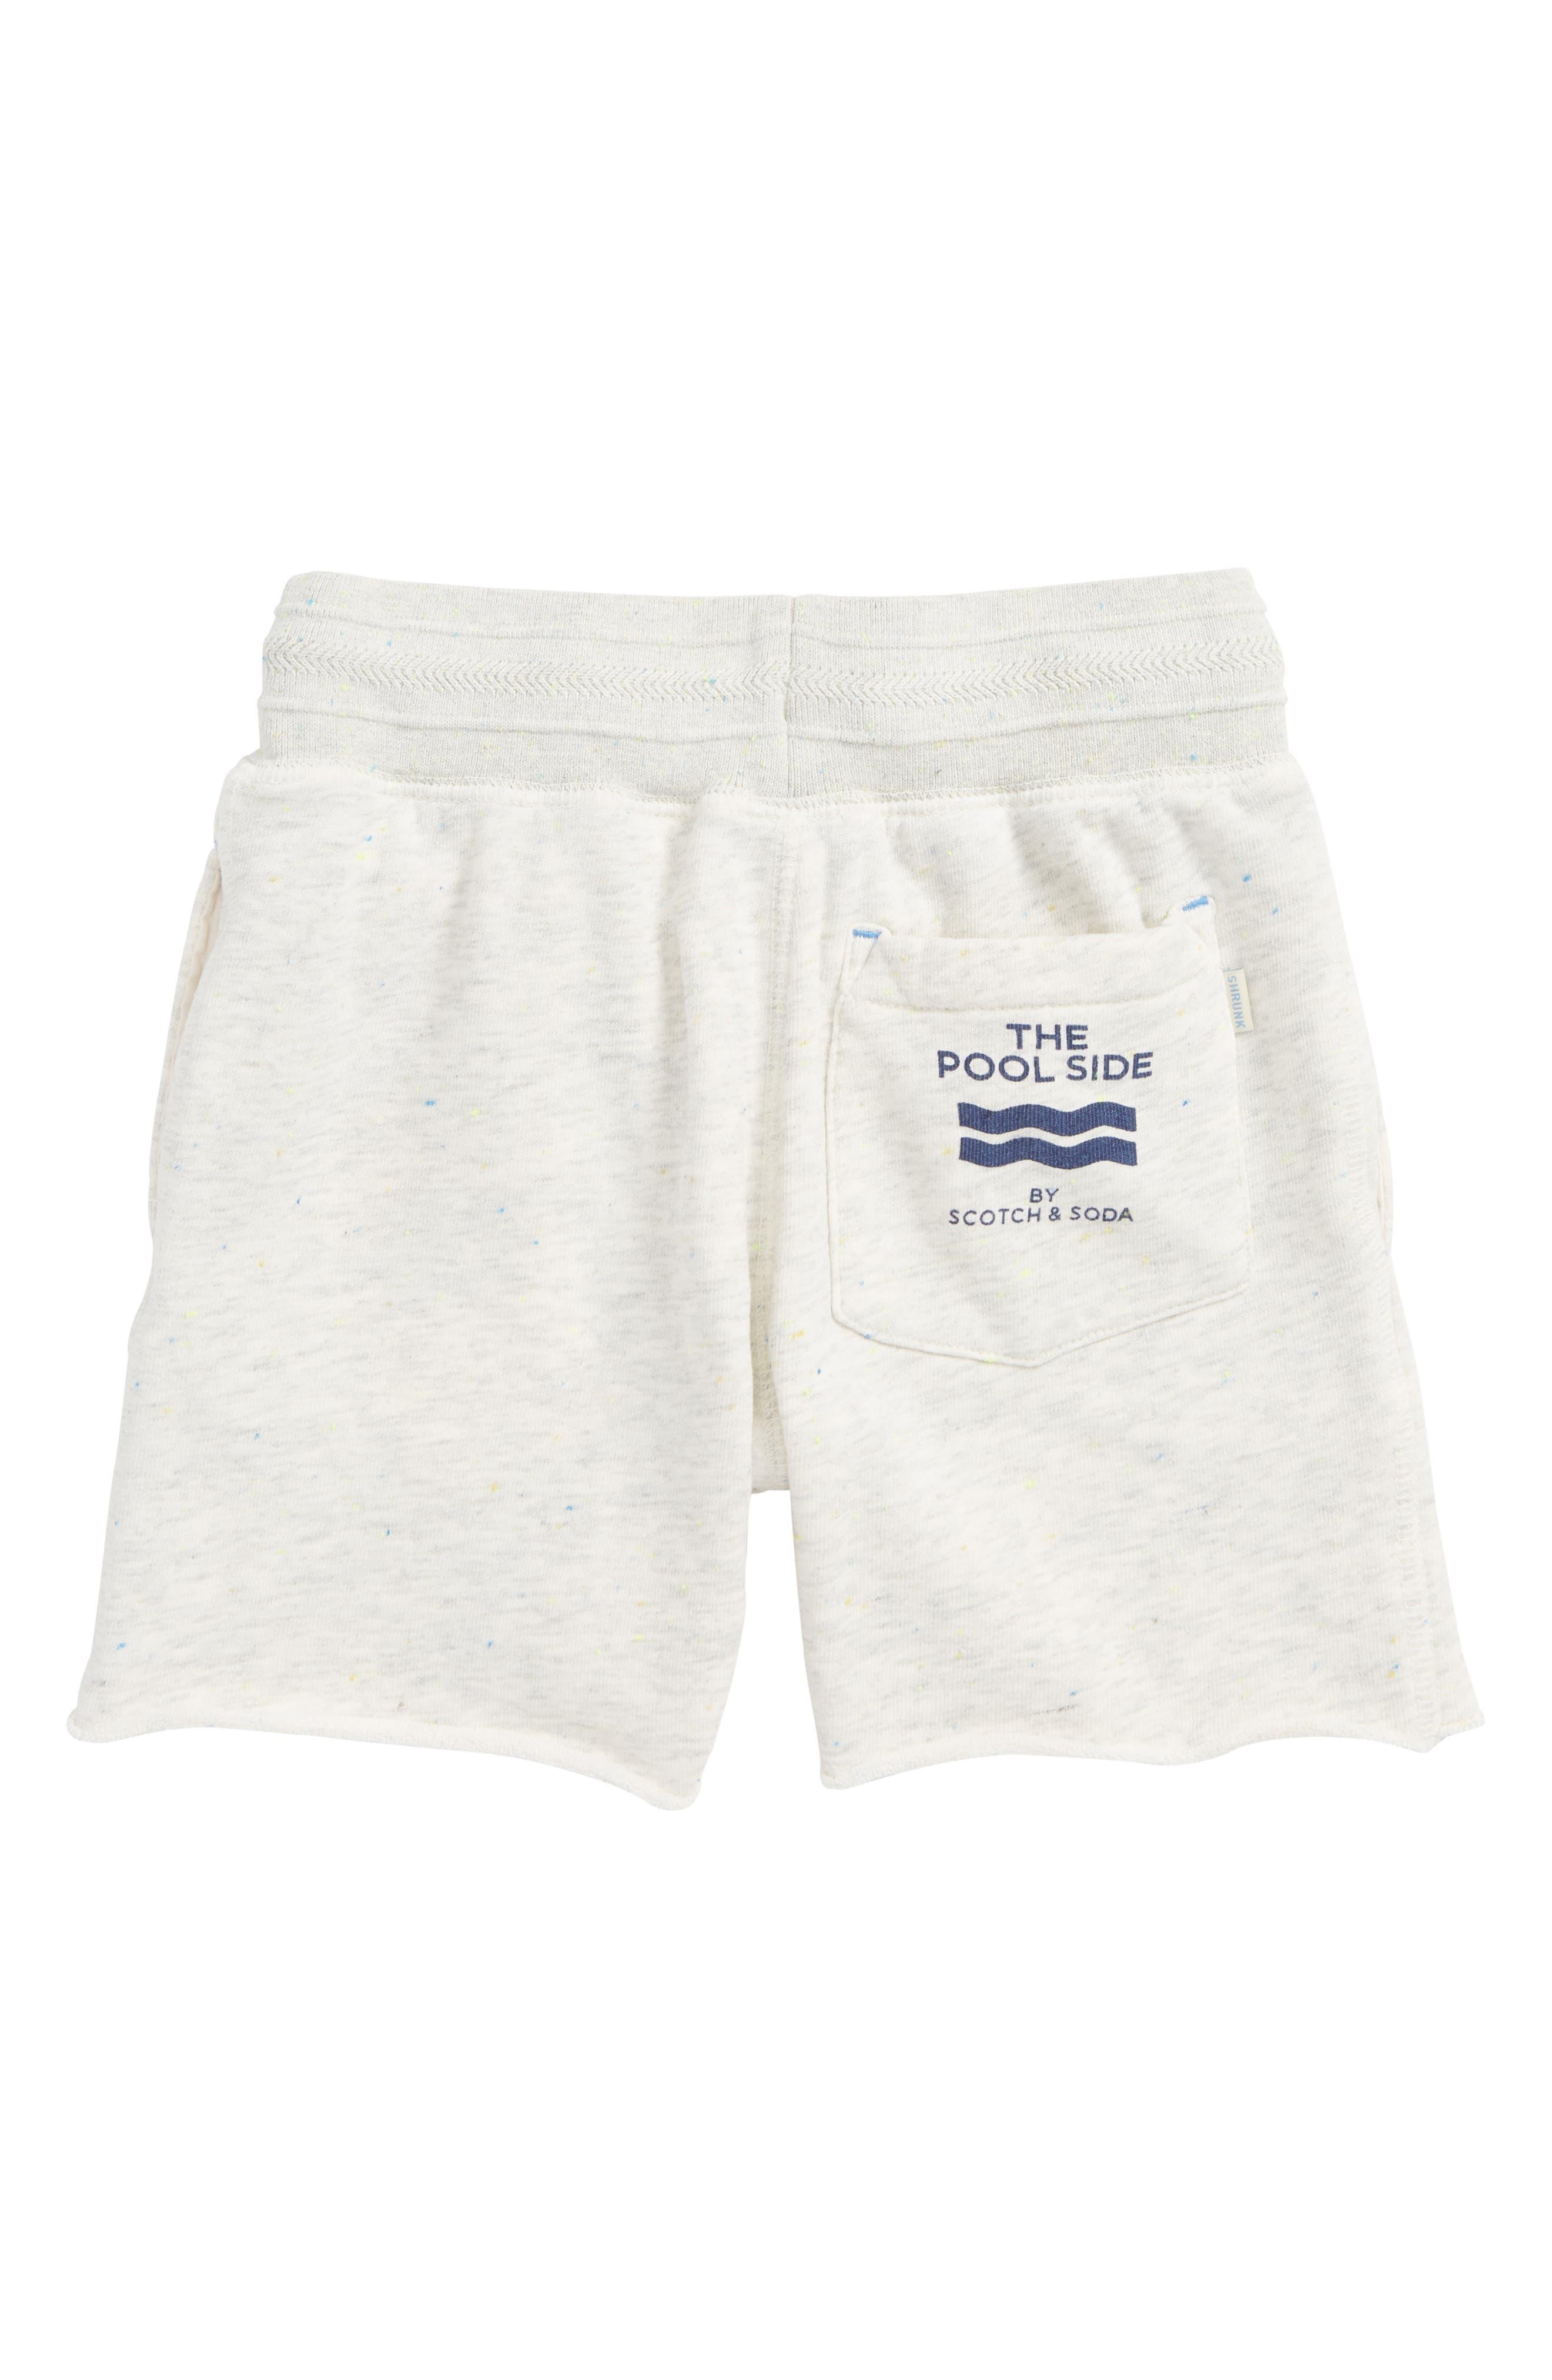 Pool Side Knit Shorts,                             Alternate thumbnail 2, color,                             Ecru